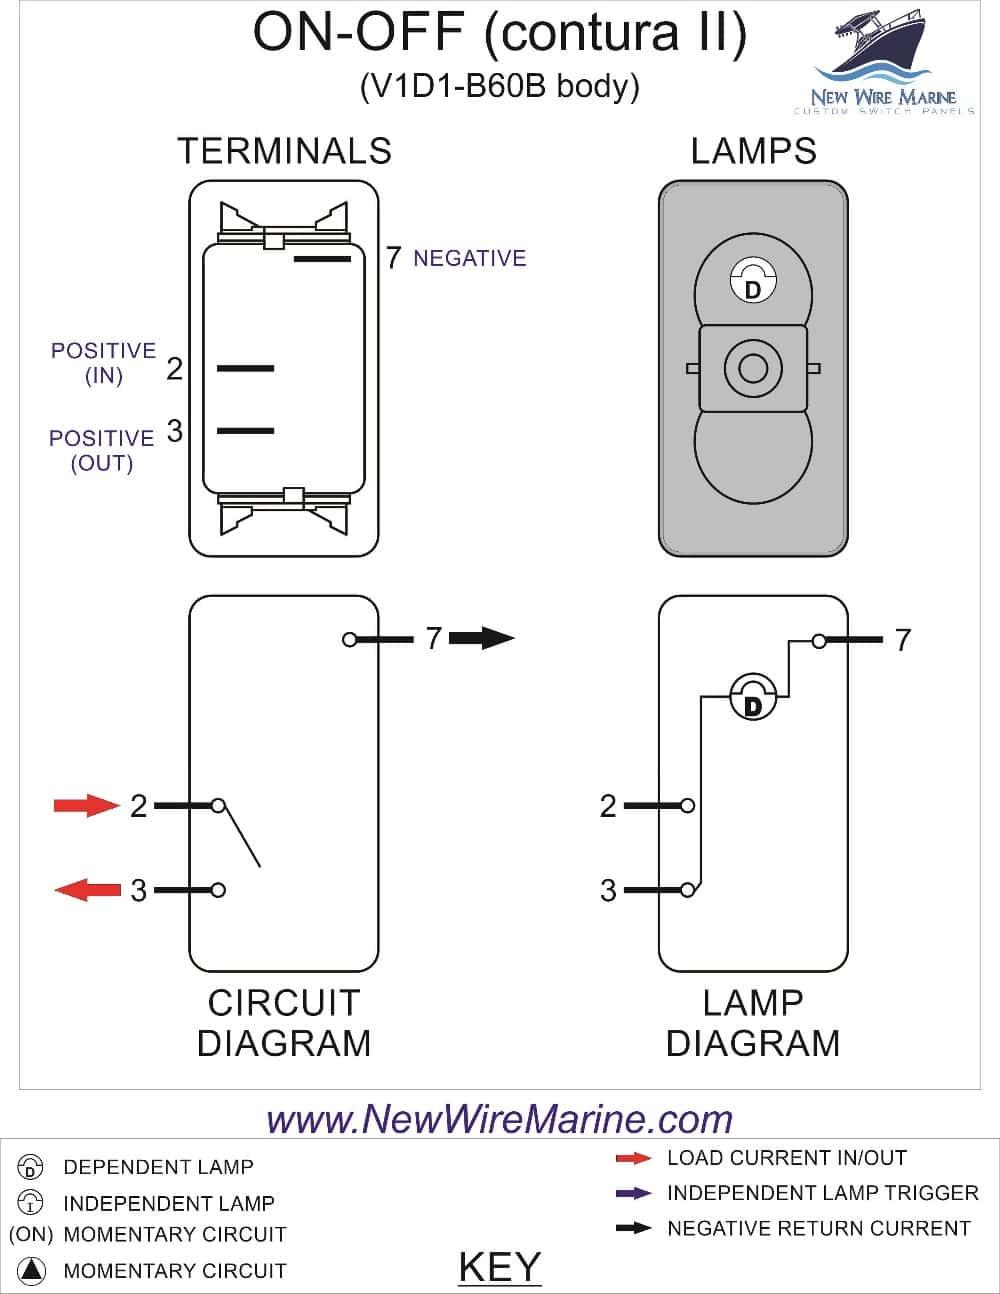 Rocker Switch Wiring Diagrams | New Wire Marine - Dpdt Switch Wiring Diagram